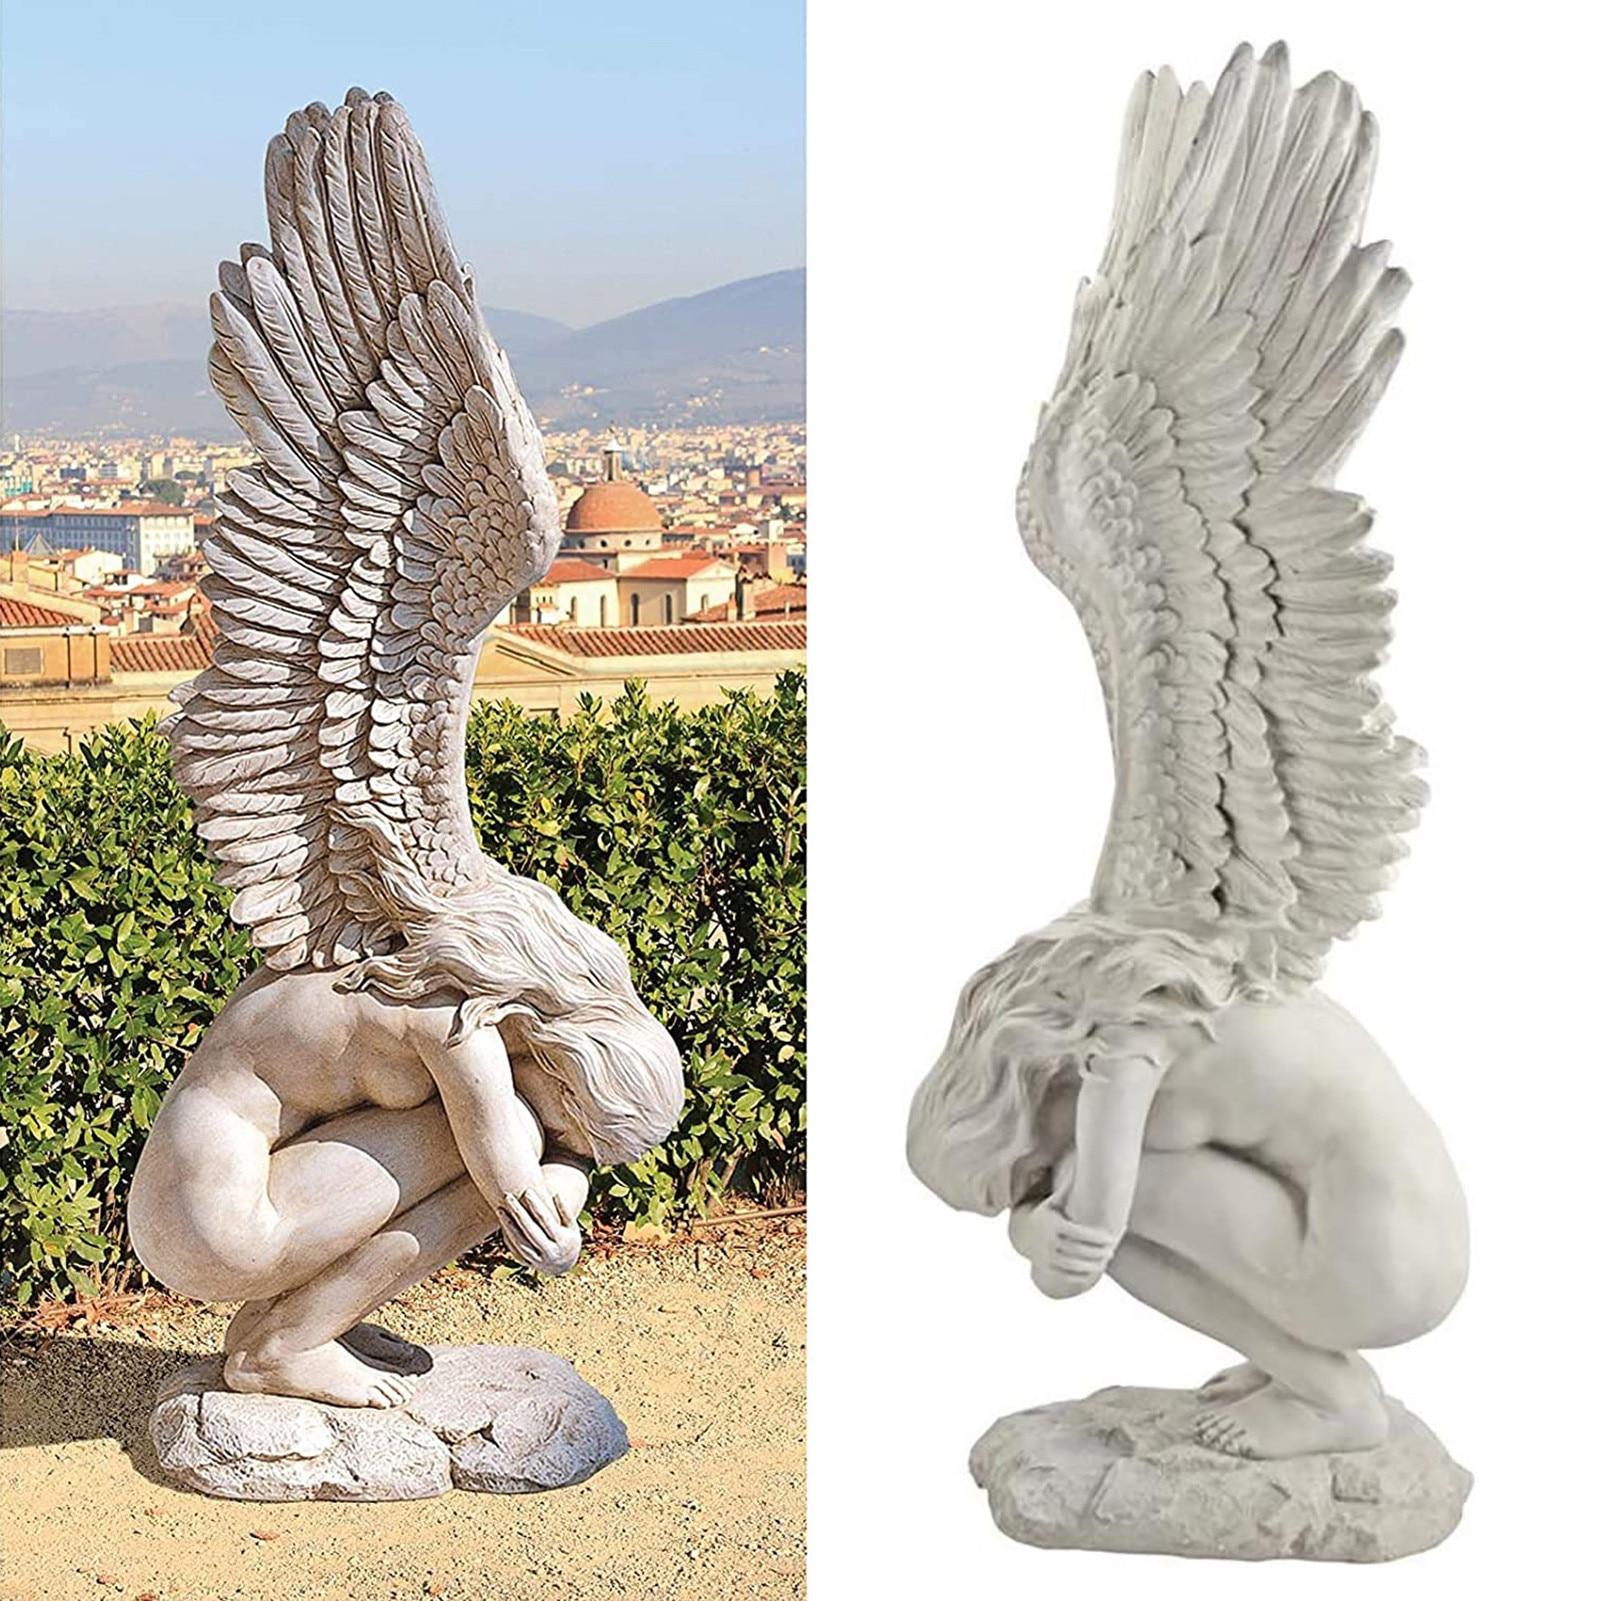 Redemption Angel Statue Ornaments Creative Sculpture Decoration Remembrance And Redemption Figurines Religious Garden Home Decor